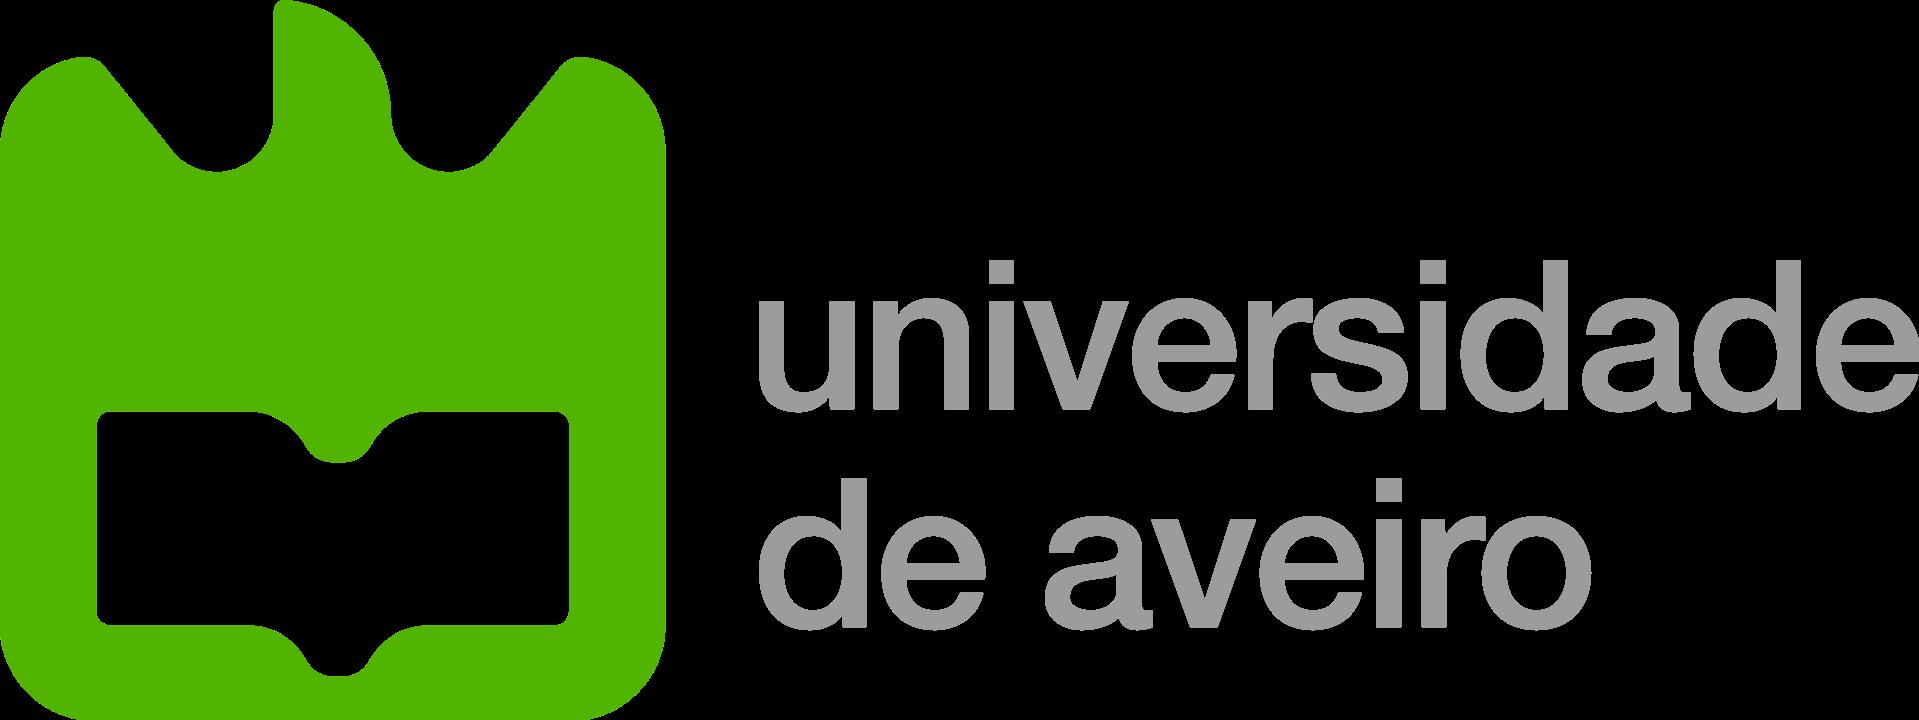 The University of Aveiro Logo